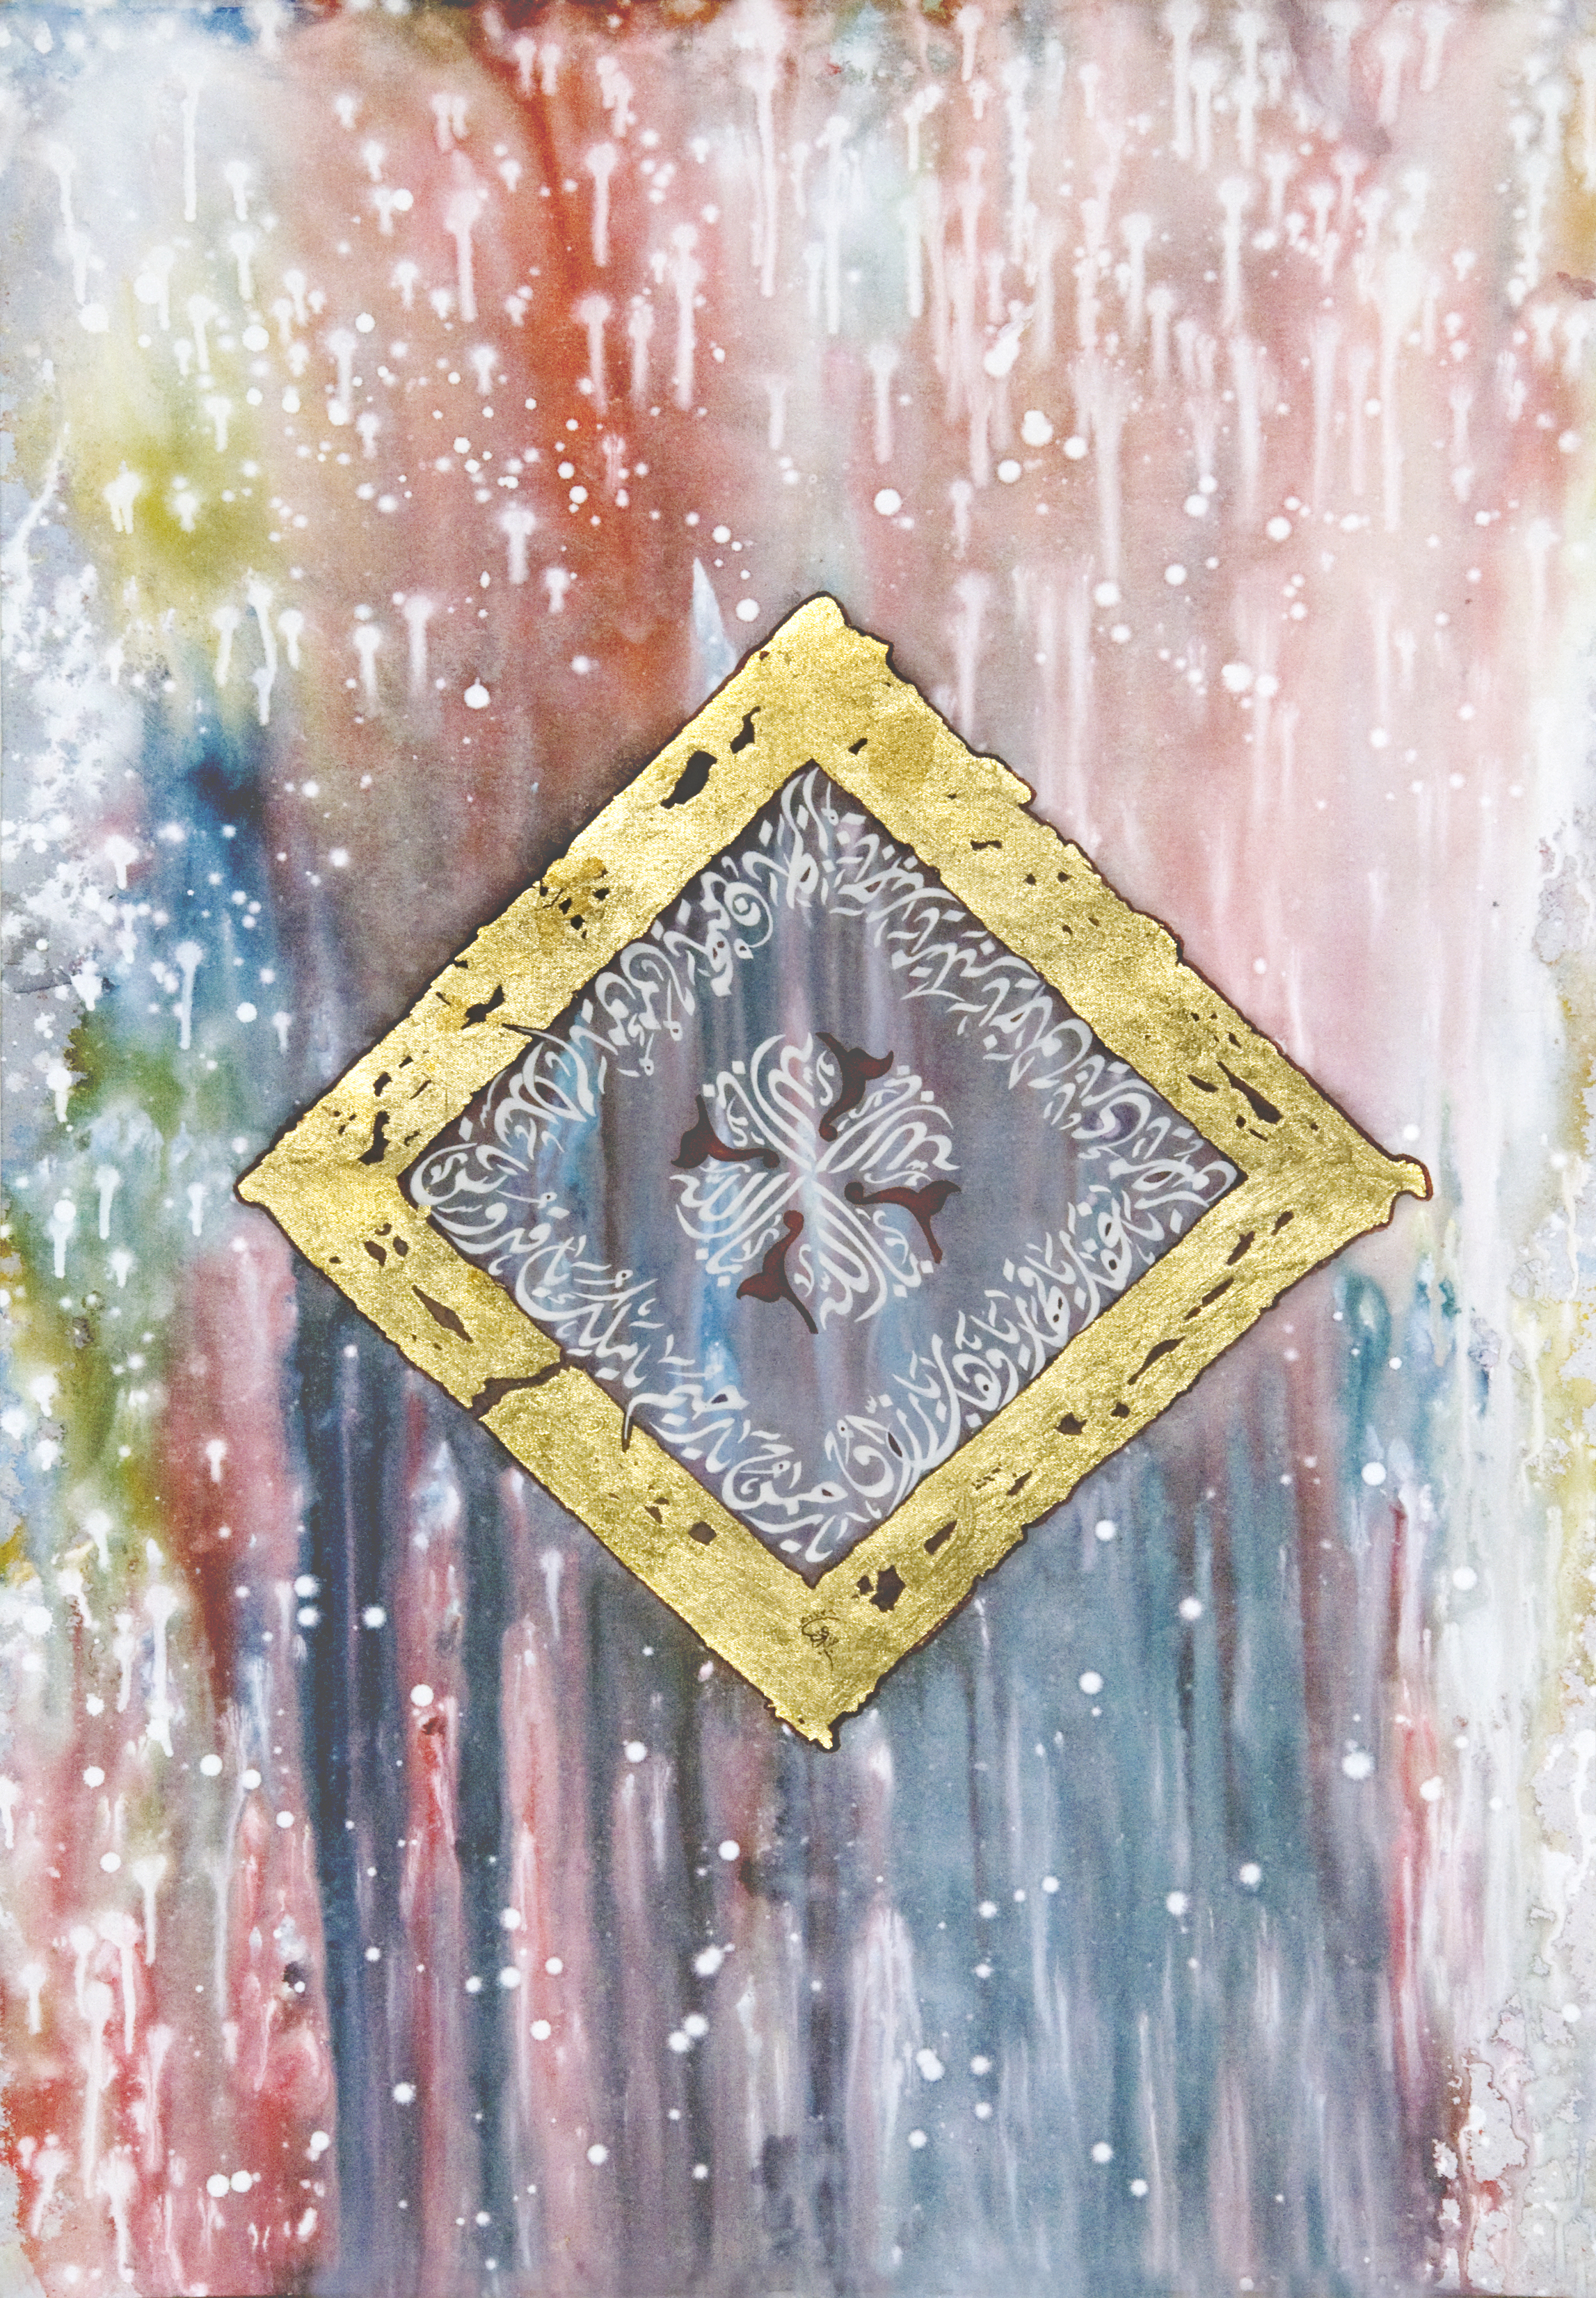 Ya Allah Ya Rahman Ya Raheem (O God, O Merciful, O Most Merciful) Acrylic & Ink & Gold paper on canvas 60 x 94 cm